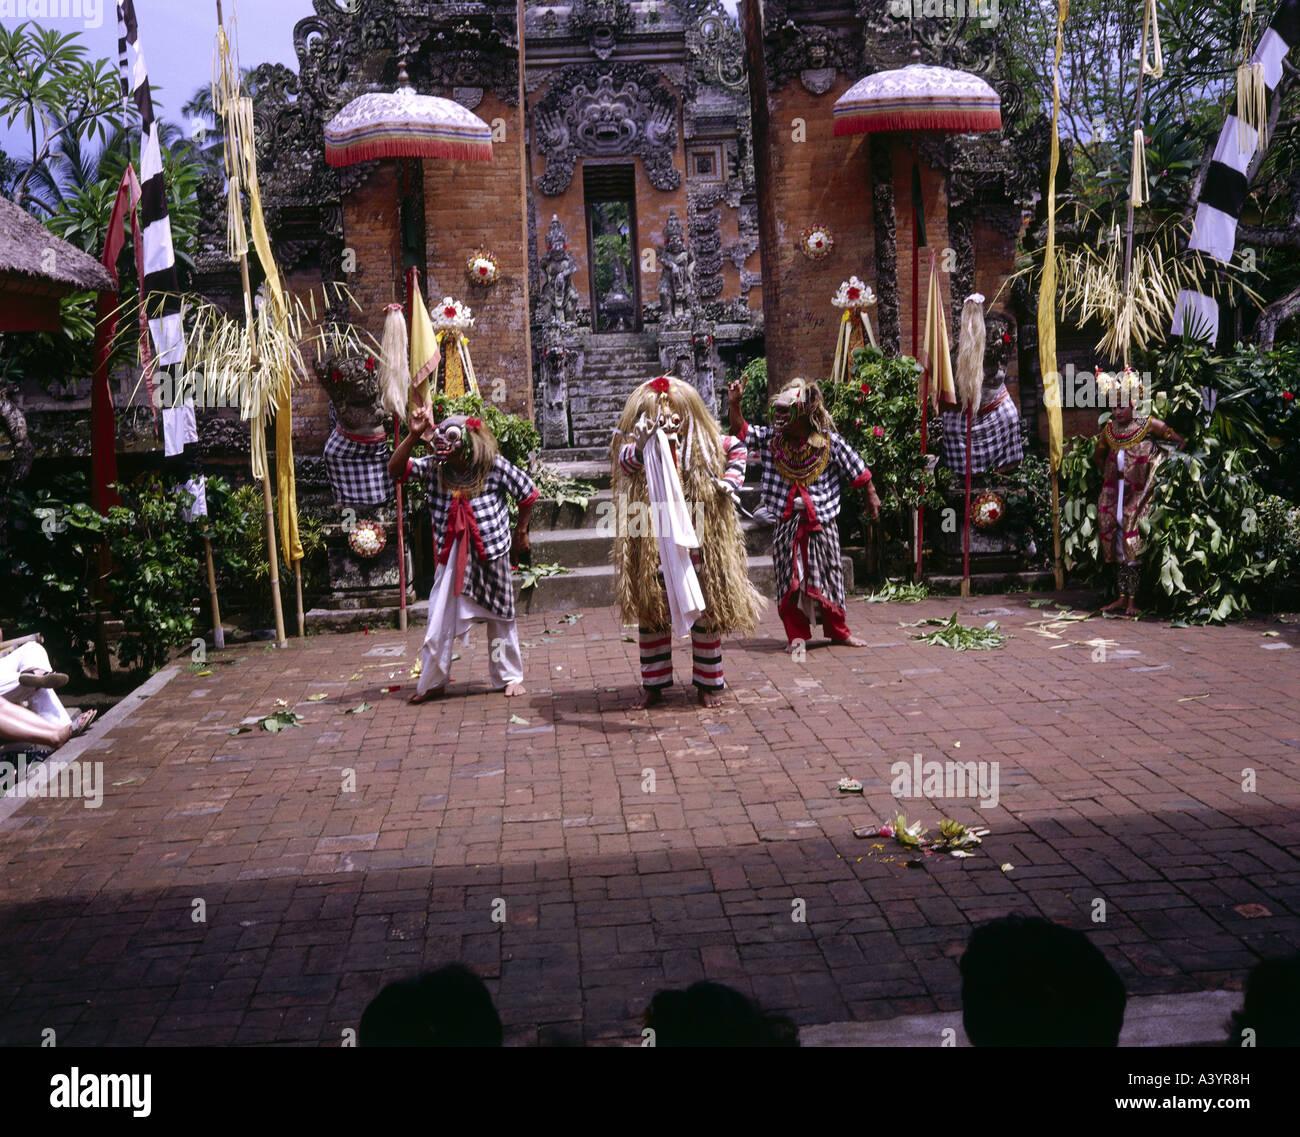 Viaje / Geografía, Indonesia, Bali, tradición / Folclore, baile Barong, aparición de Rangda, Sudeste Imagen De Stock